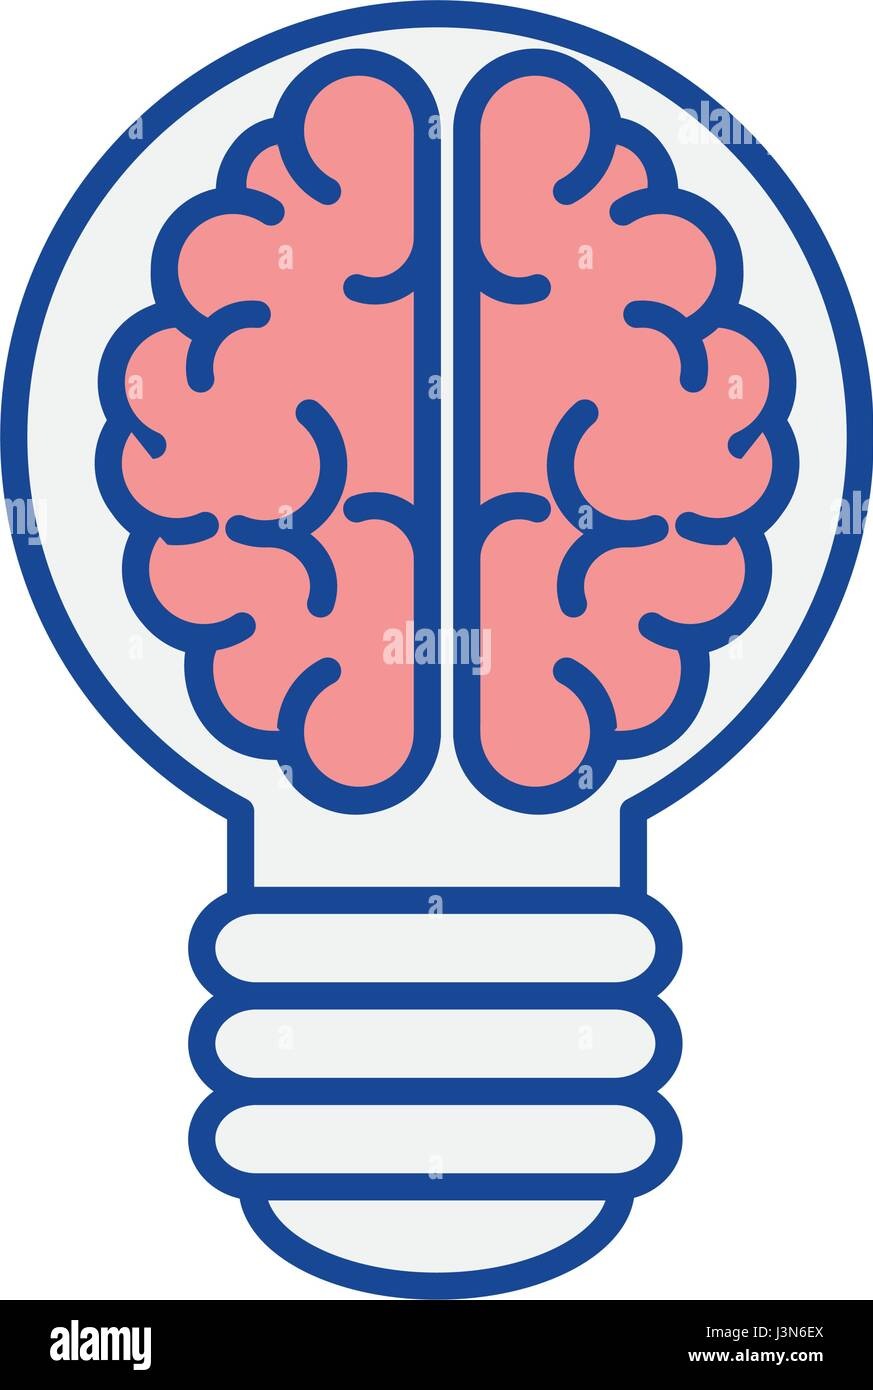 brain bulb icon - Stock Image